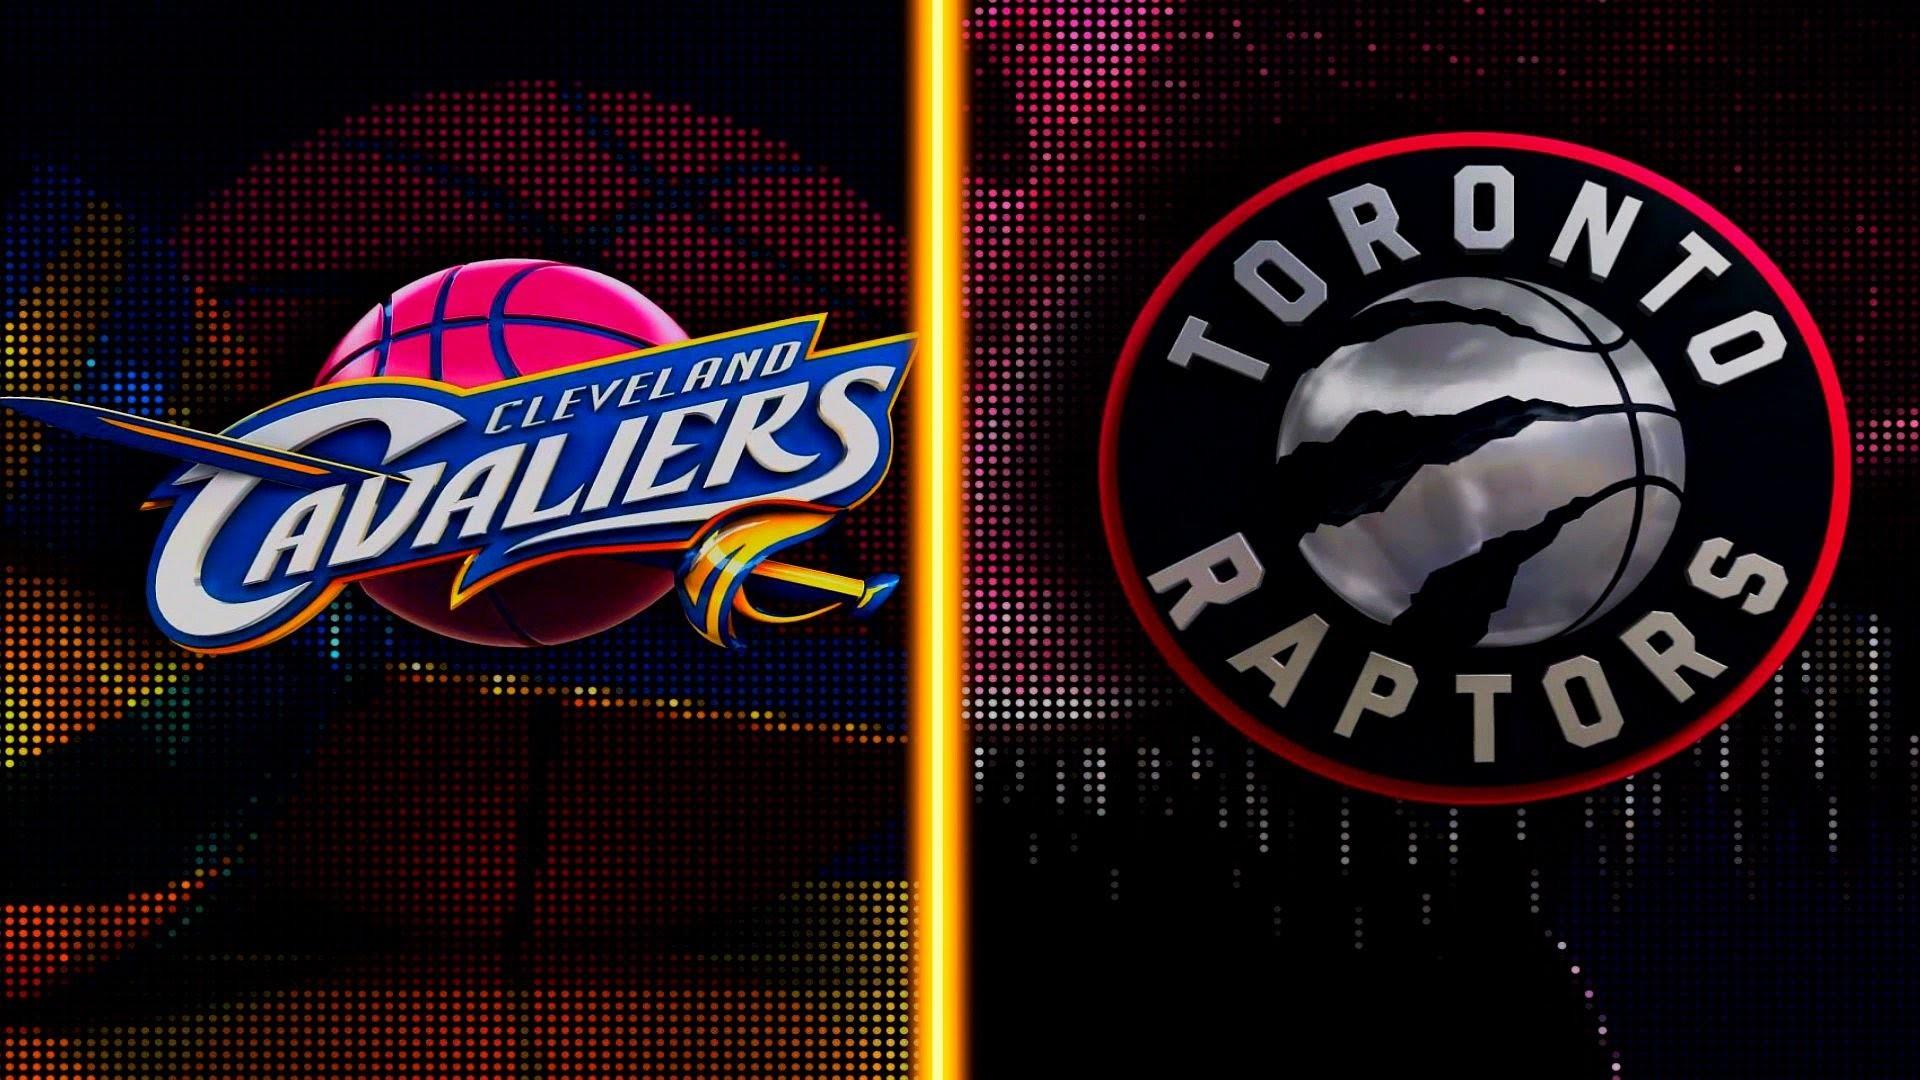 PS4: NBA 2K16 – Cleveland Cavaliers vs. Toronto Raptors [1080p 60 FPS] –  YouTube